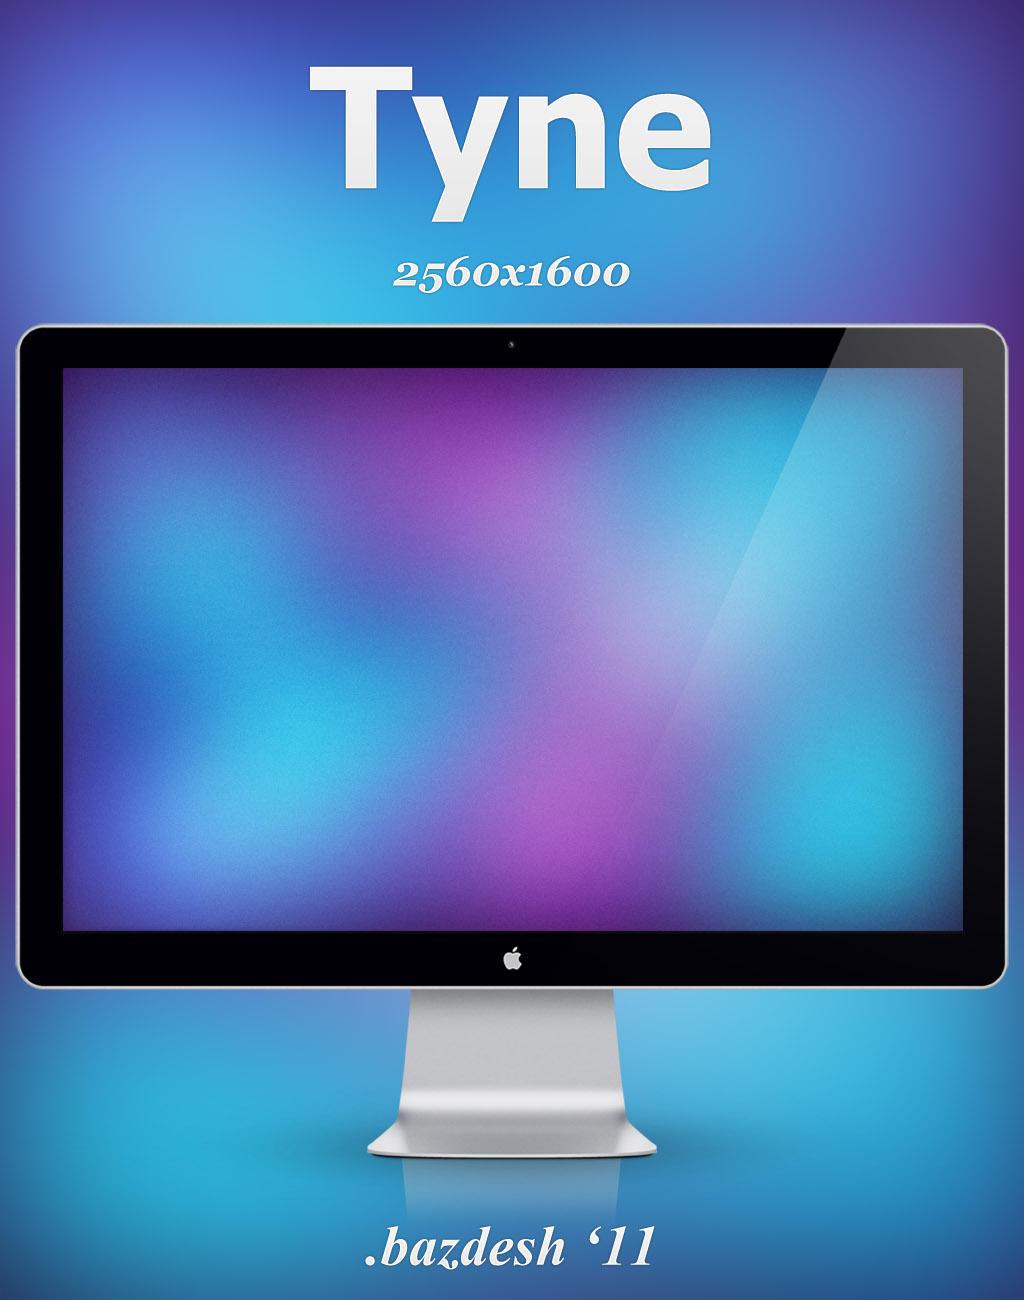 Tyne by bazdesh